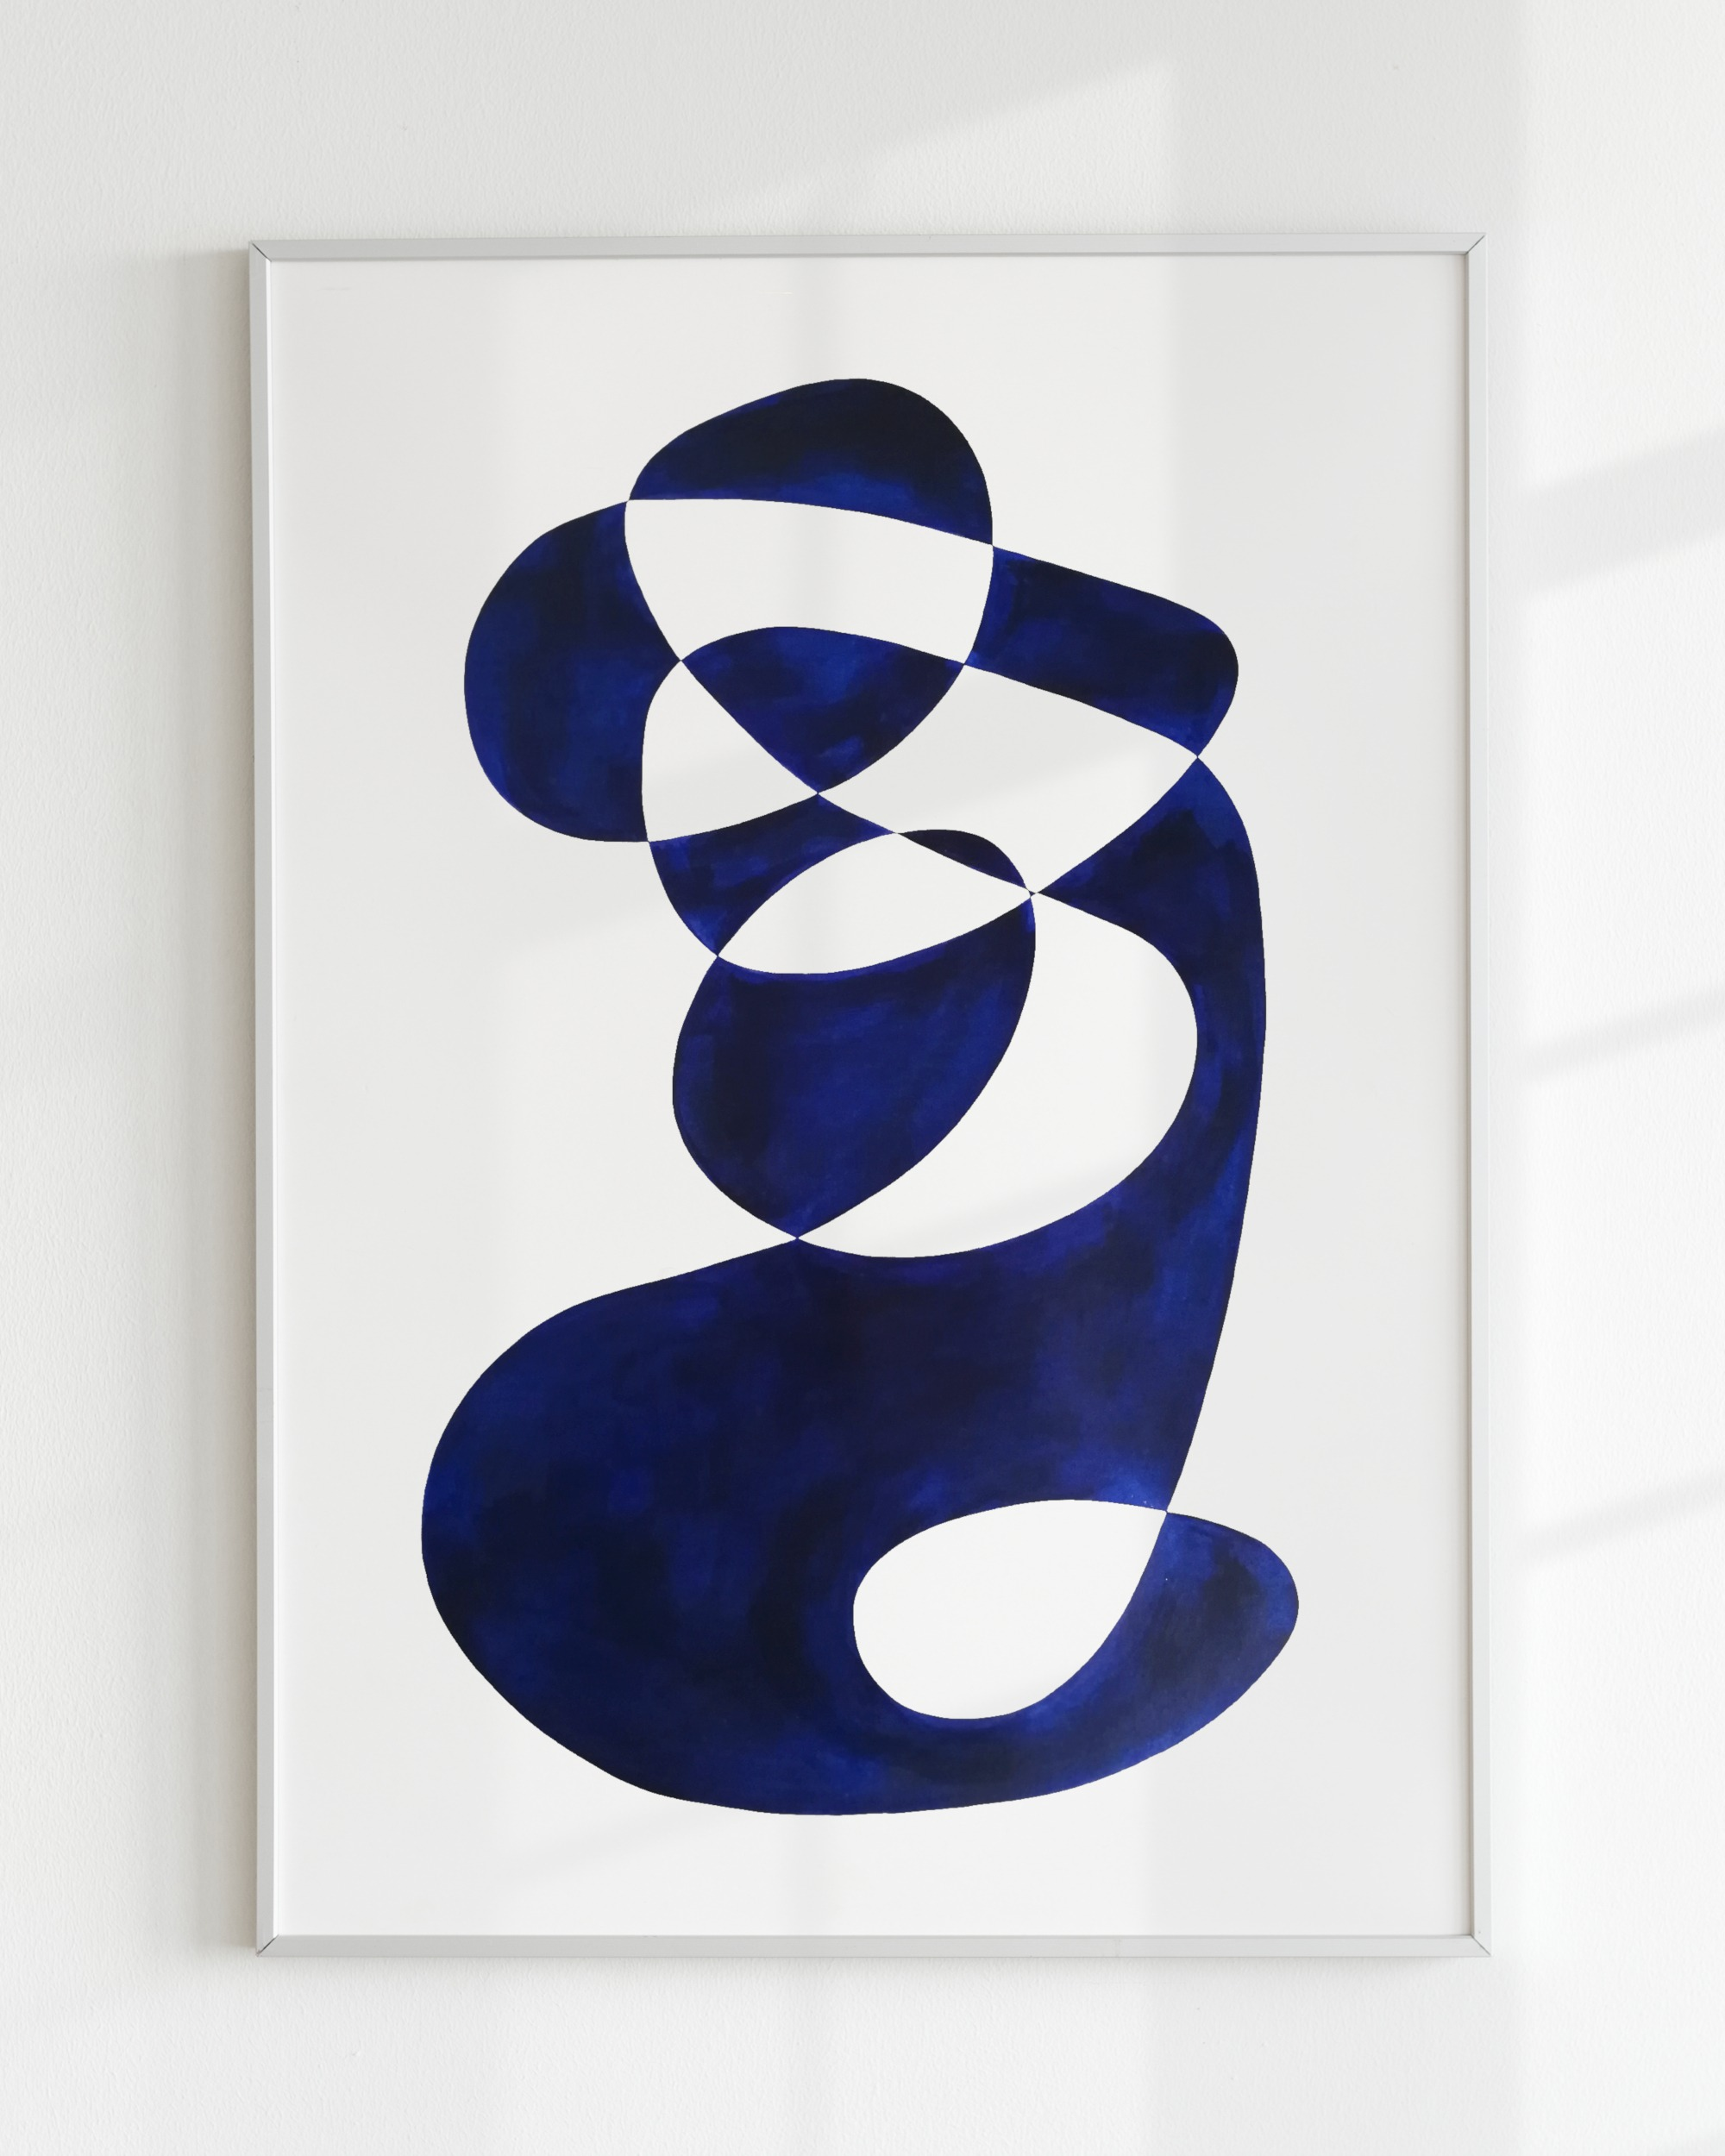 SHAPE STUDY – Bleu de prusse small II